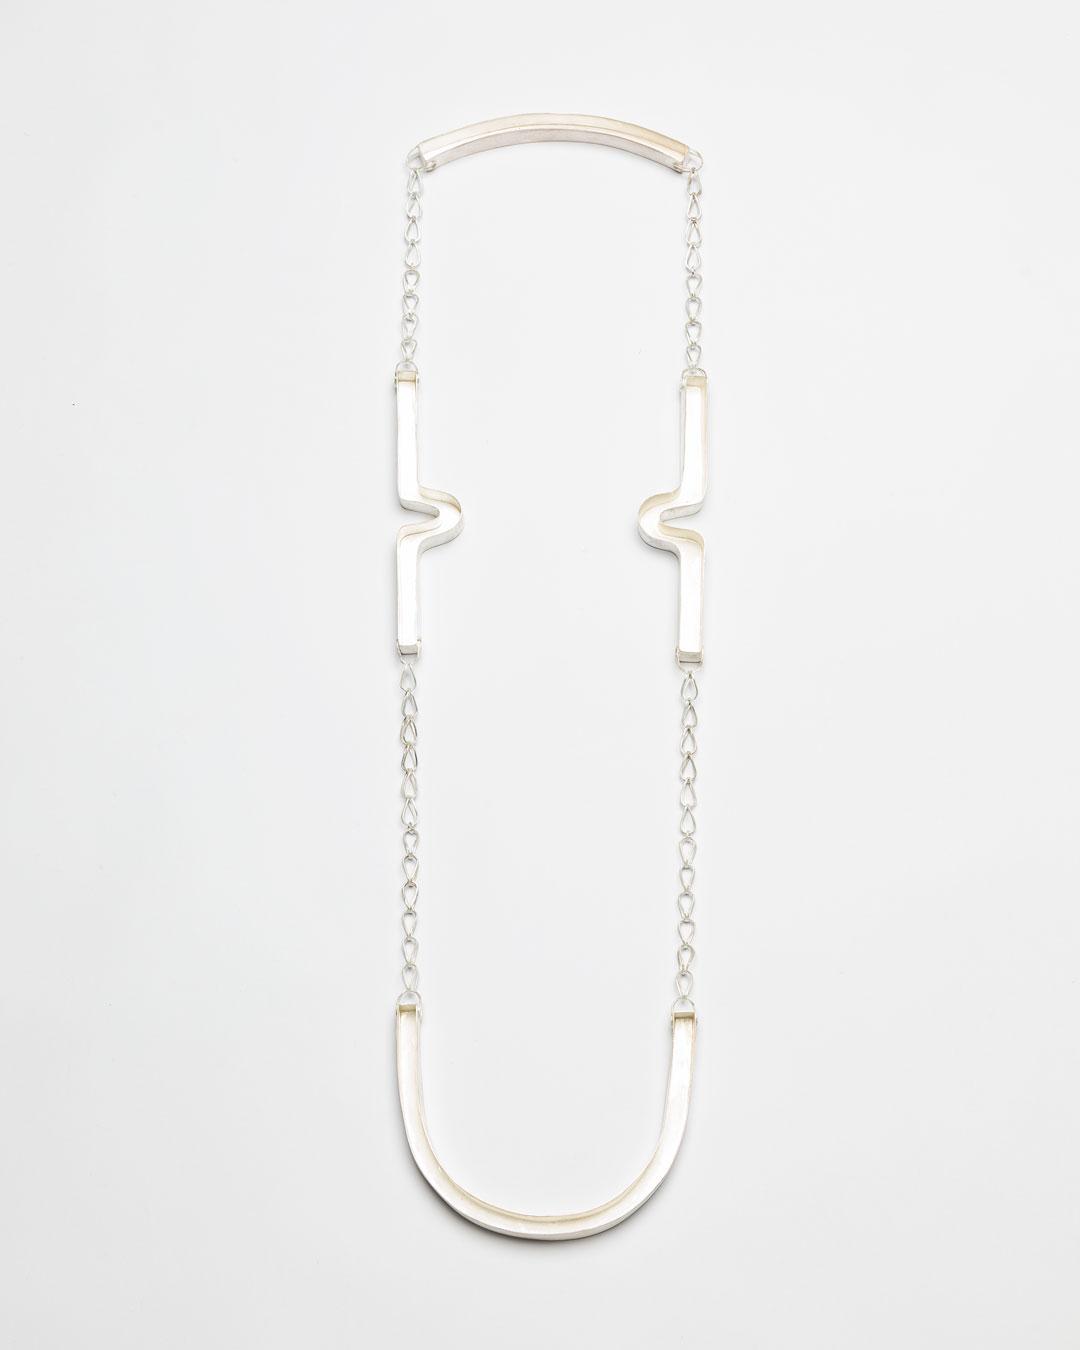 Christine Matthias, untitled, 2018, necklace; silver, L 1250 mm, €3525